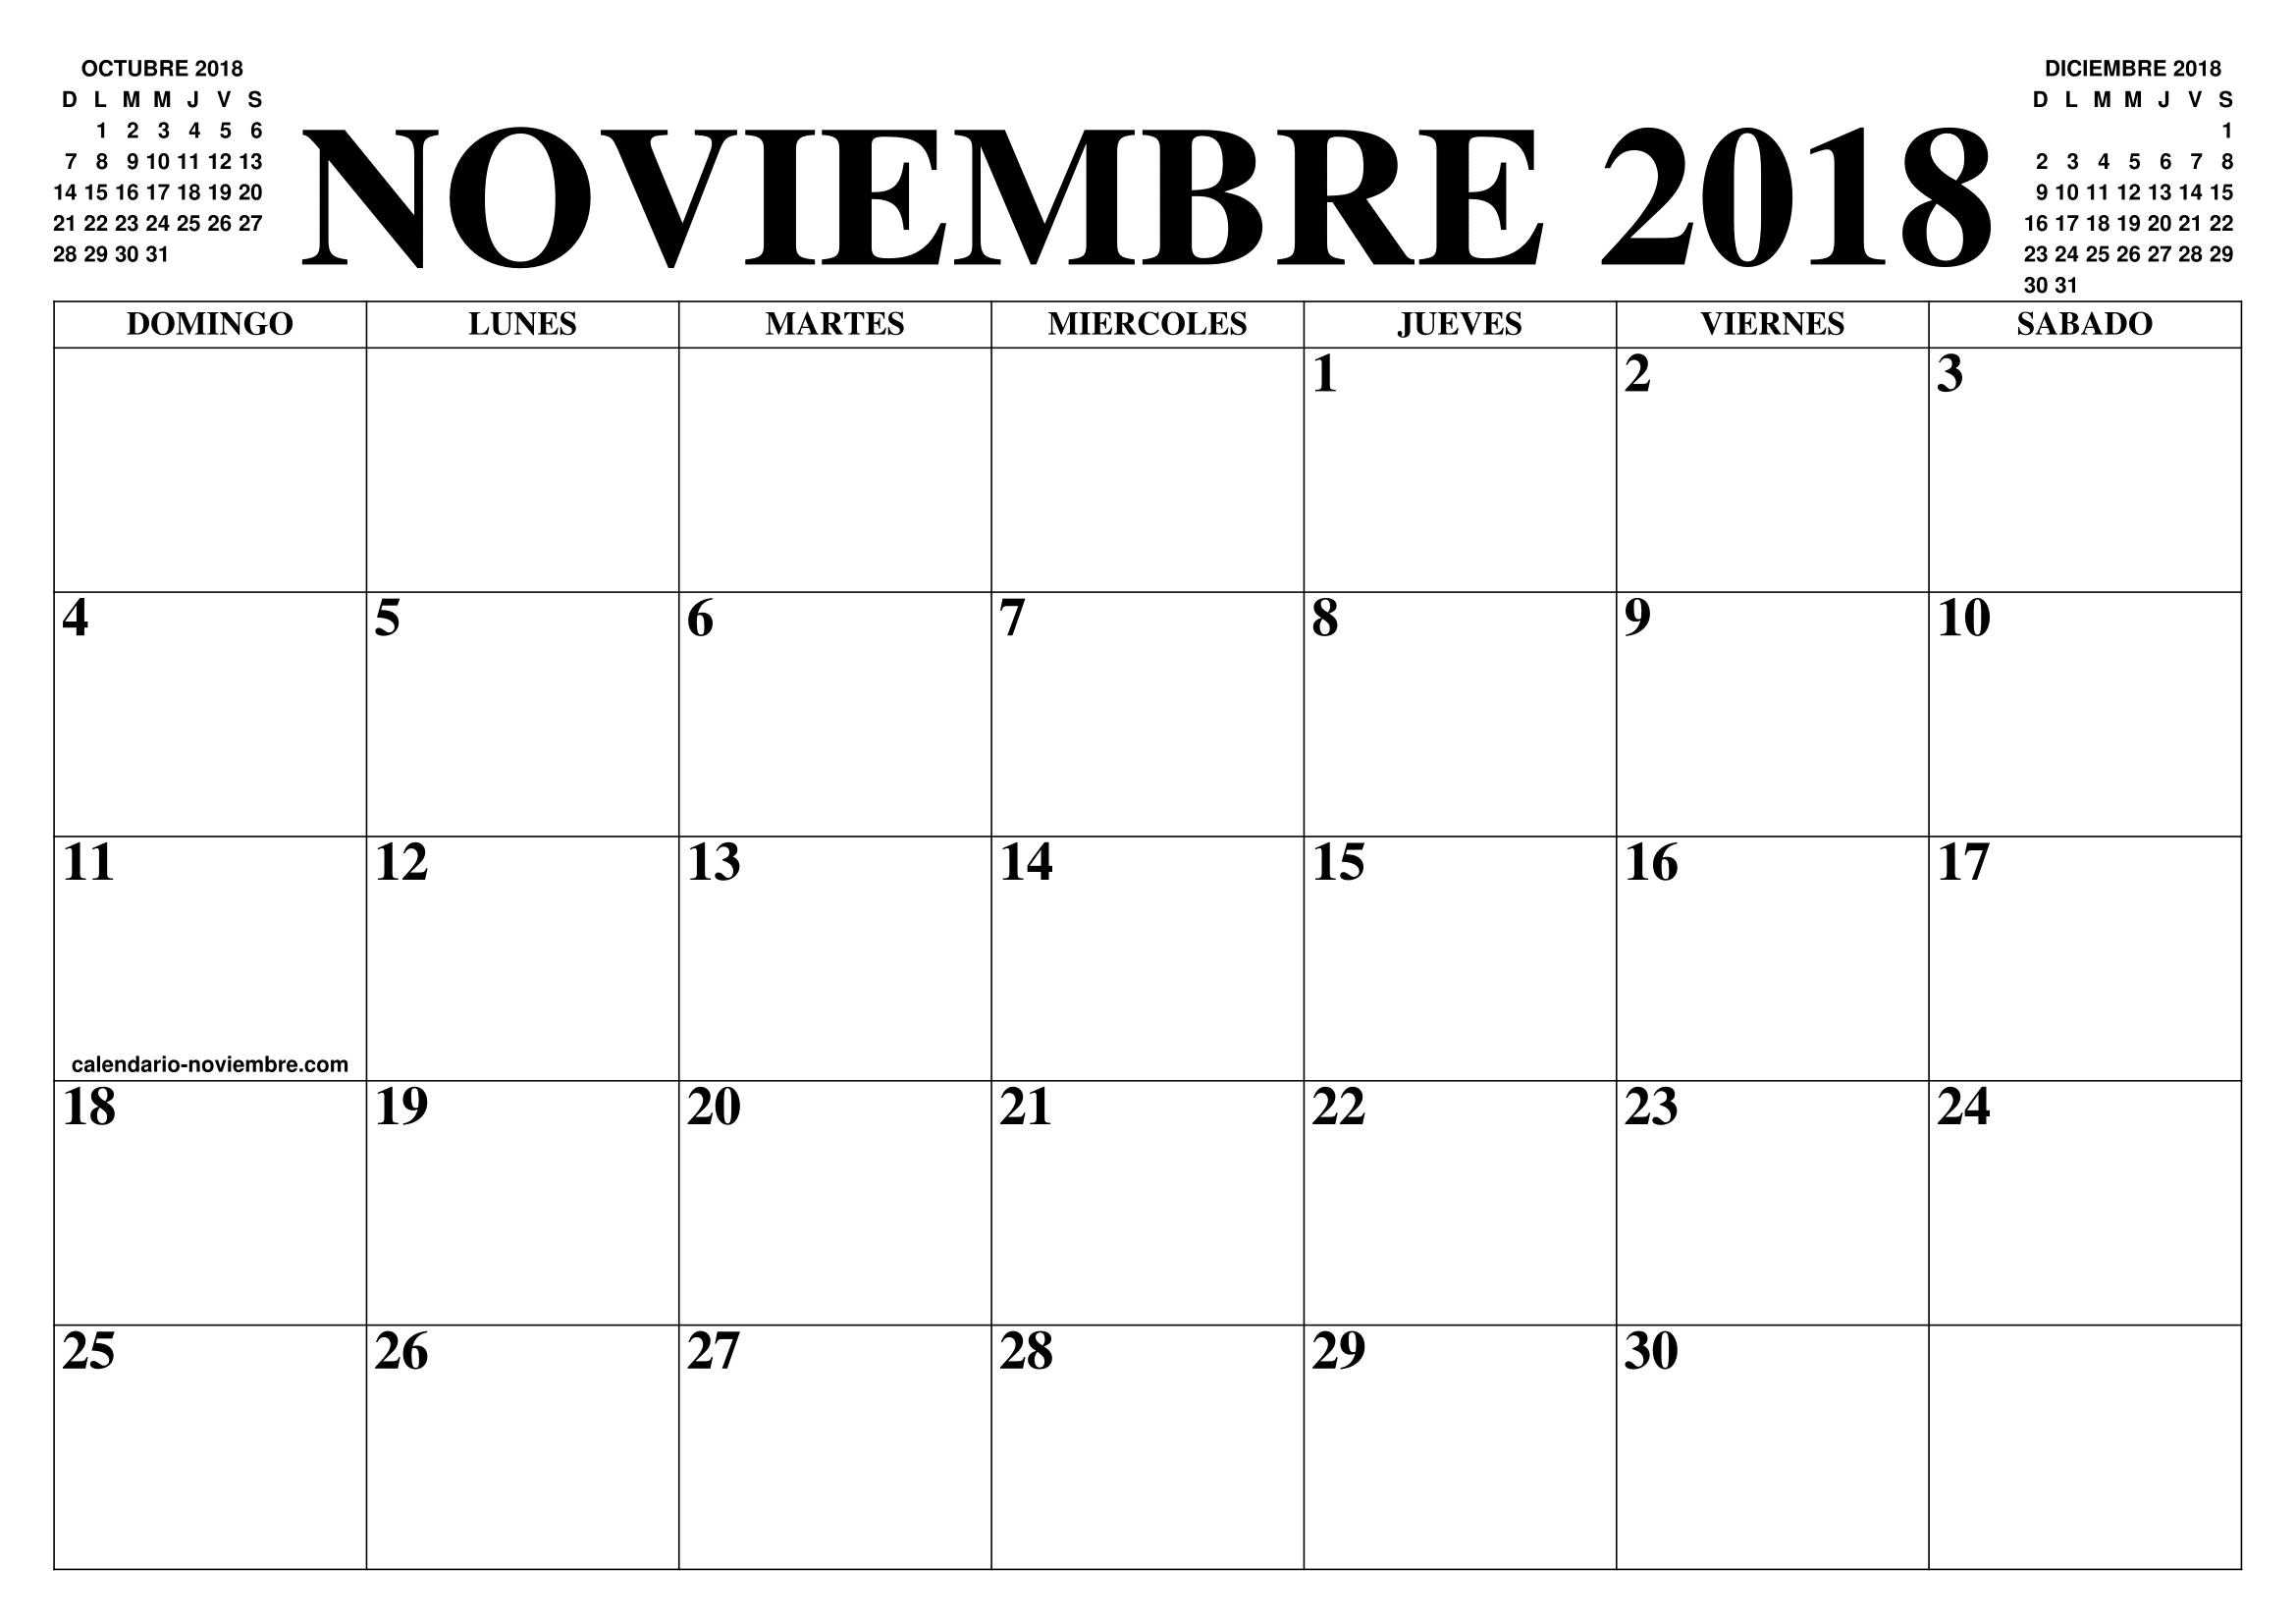 Calendario noviembre 2018 para imprimir for Almanaque de pared 2018